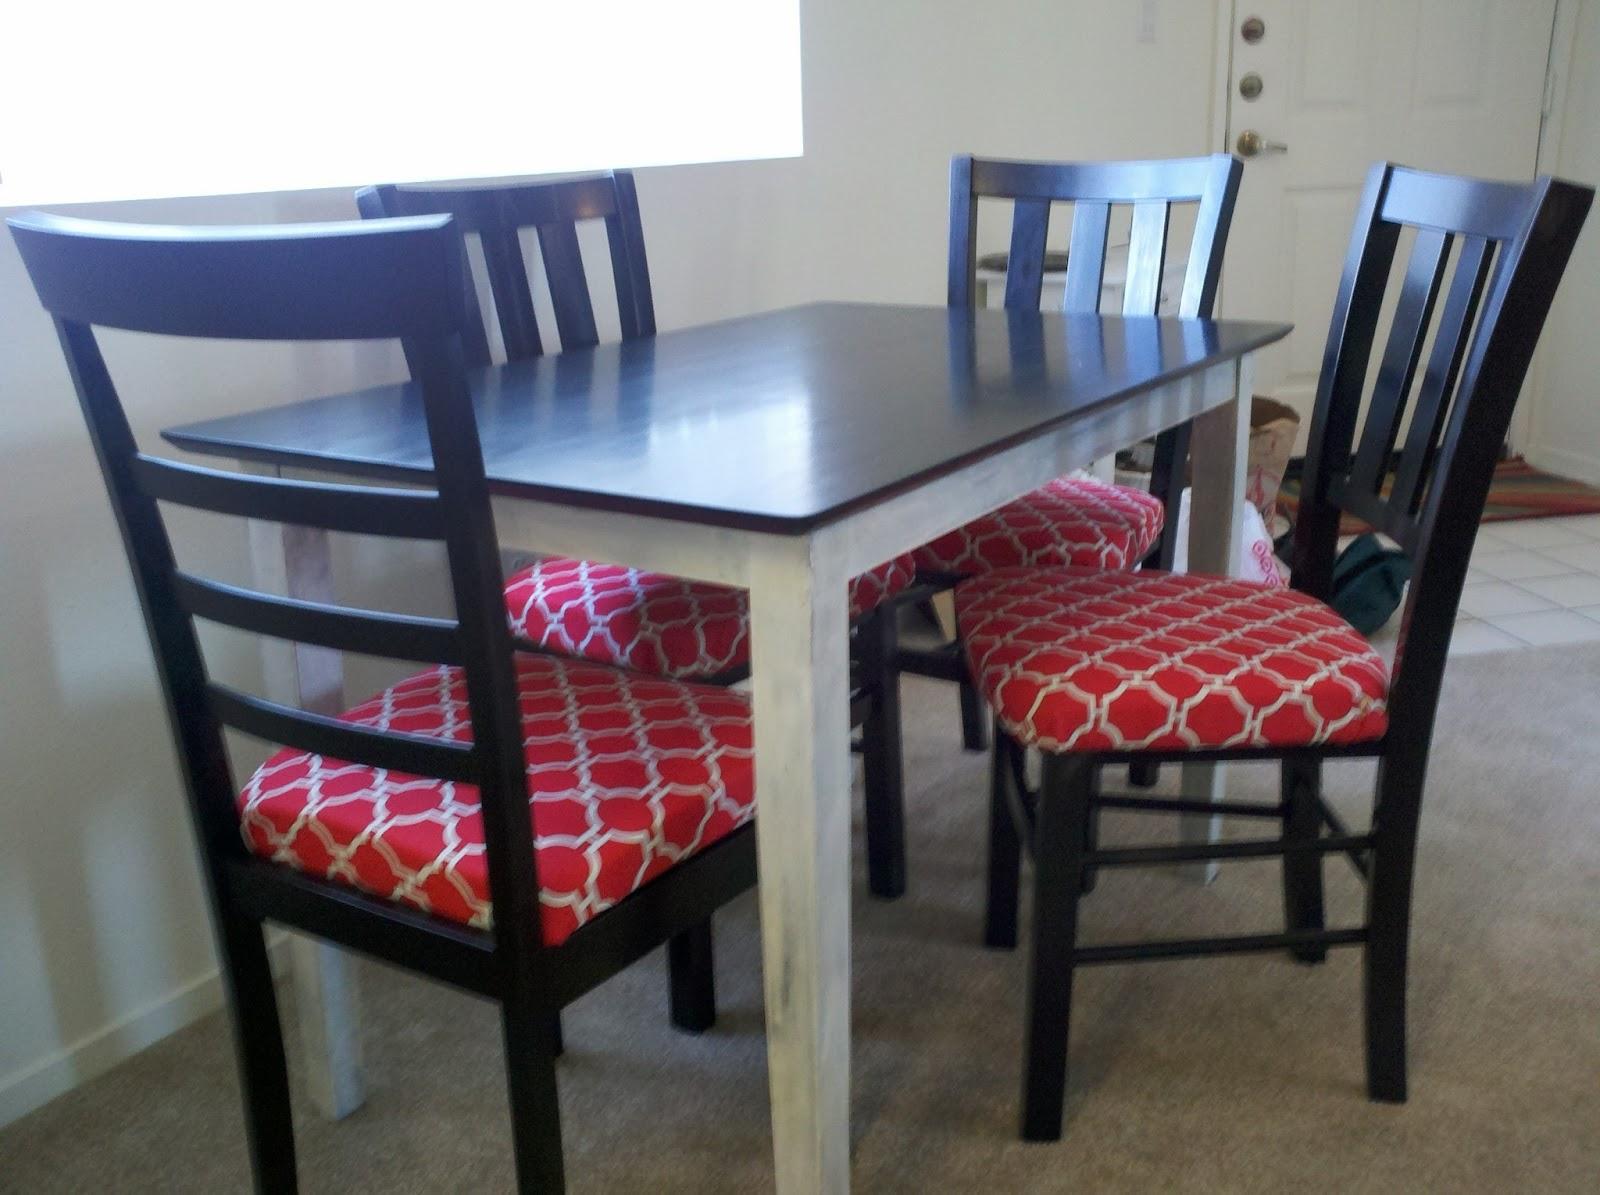 Dining room chair cushions Dining room furniture chair cushions CVLVYEK